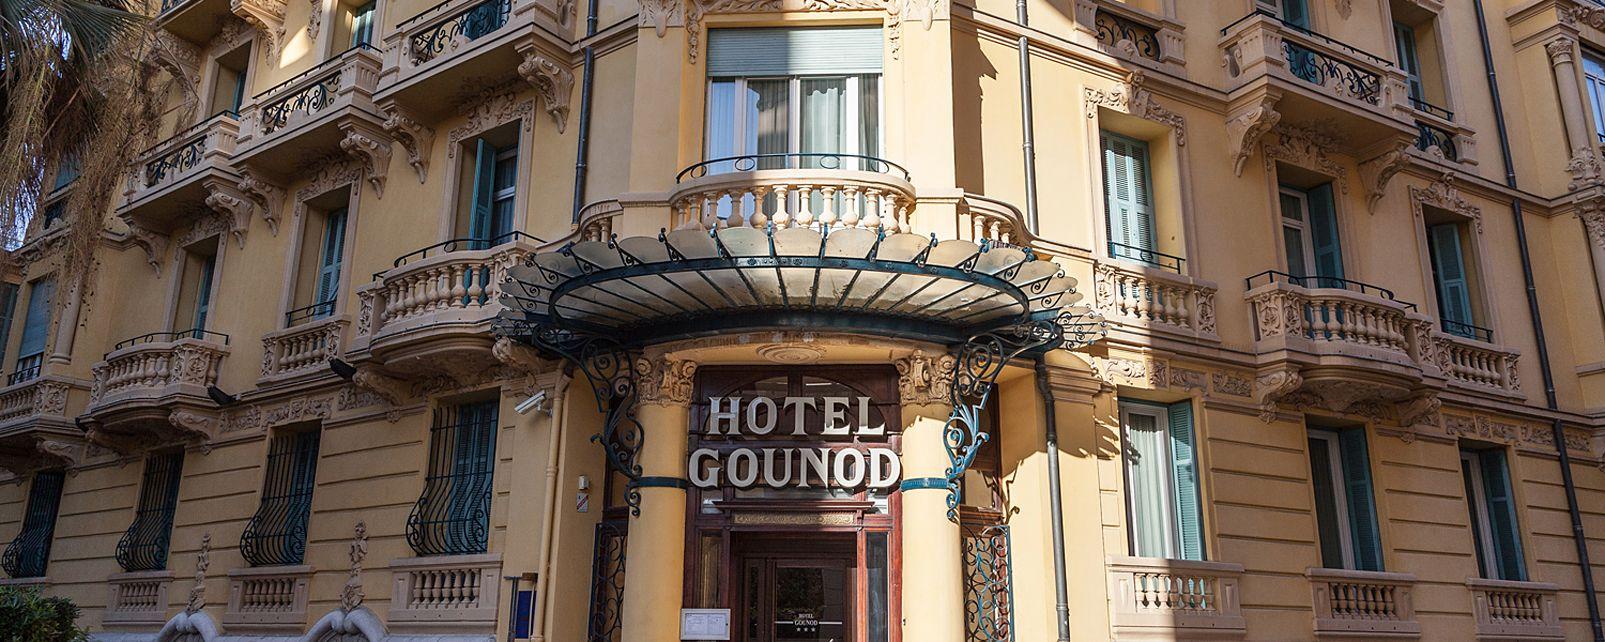 Hotel Gounod Hotel Nice